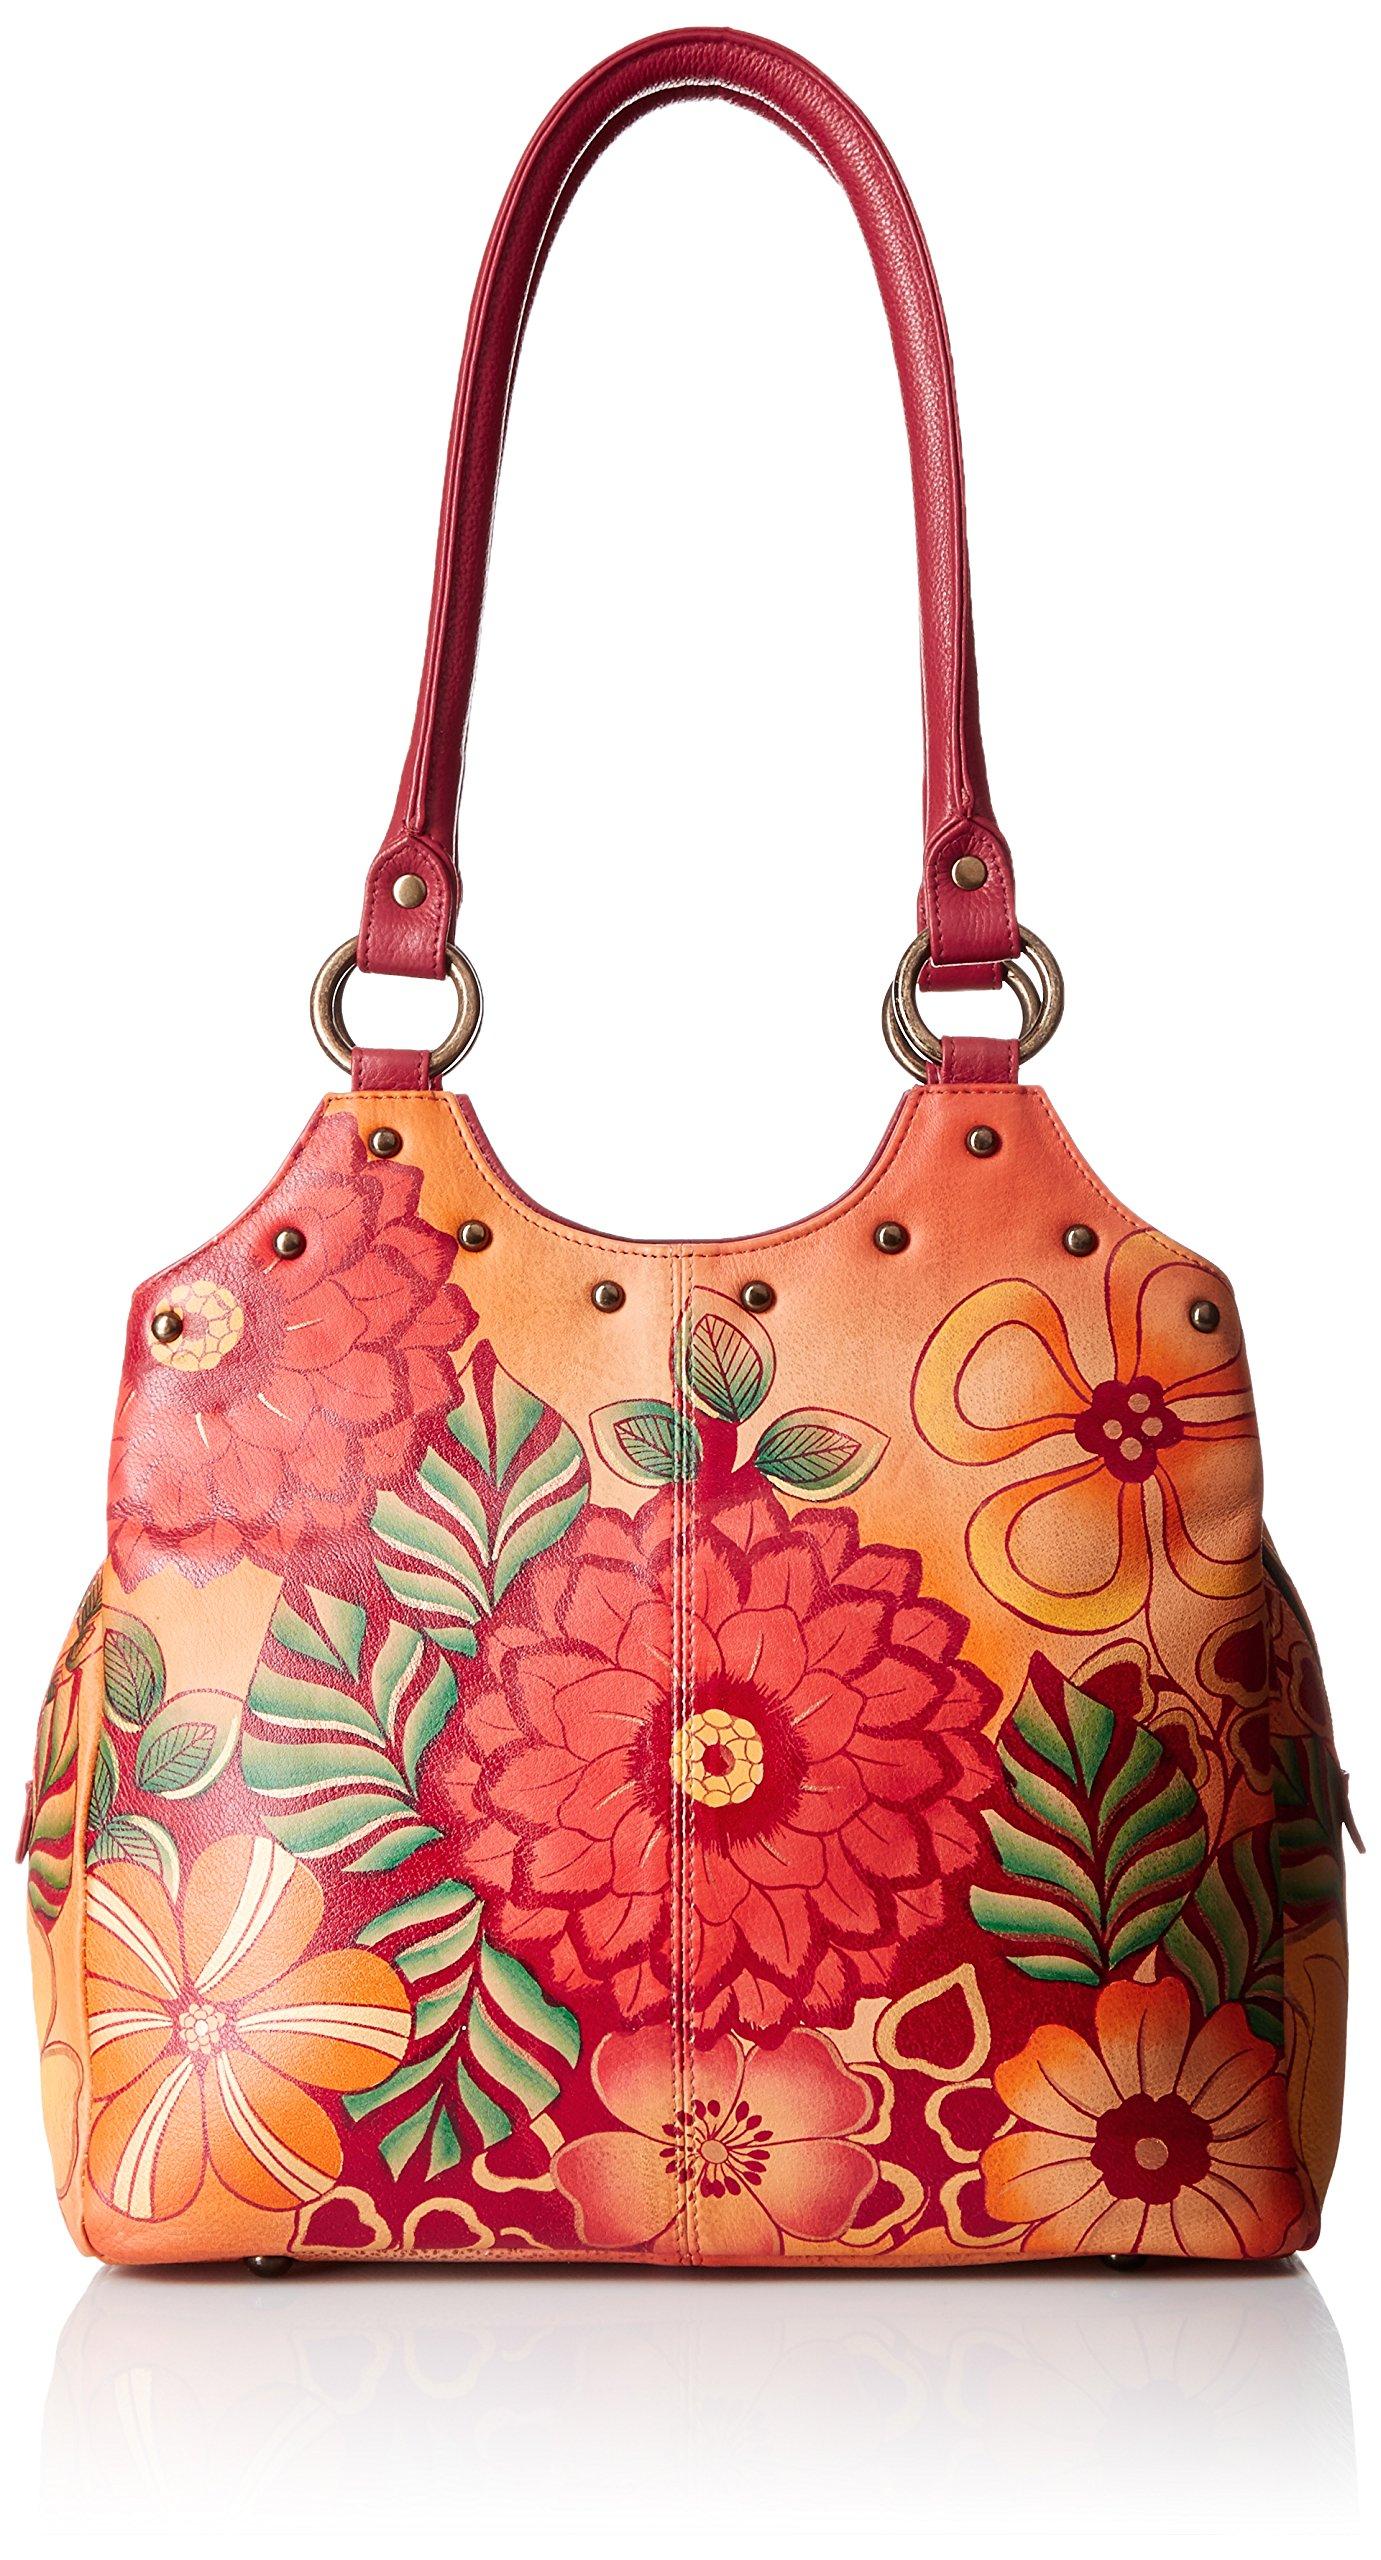 Anuschka Handpainted Leather Triple Compartment Medium Satchel, Summer Bloom